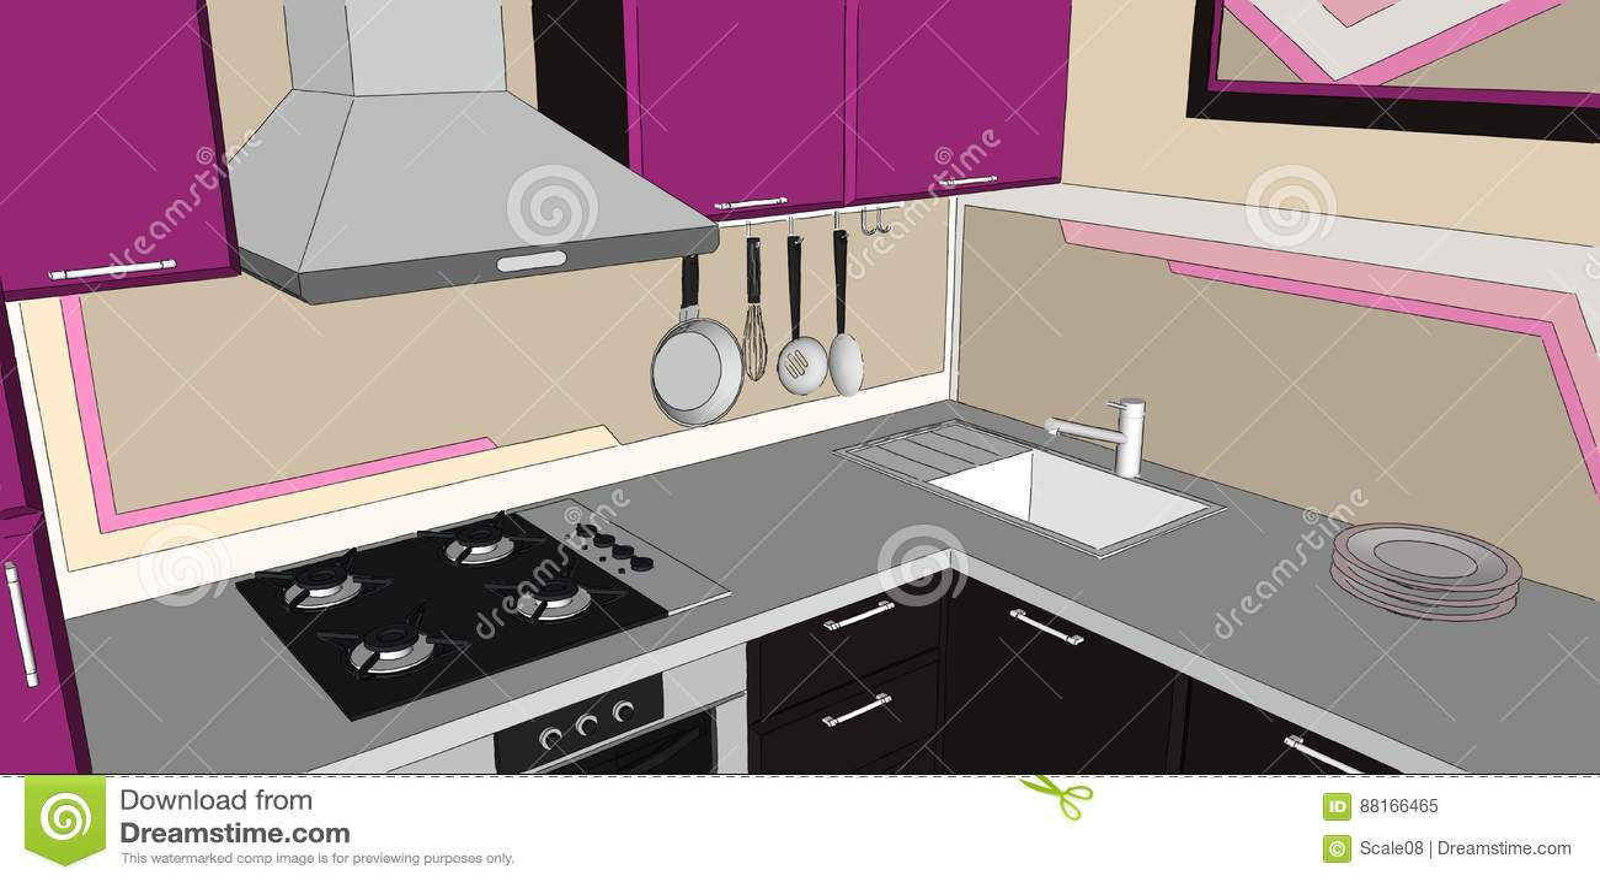 Kitchen Hob Cartoon ~ Kitchen interior with purple wall cartoon vector